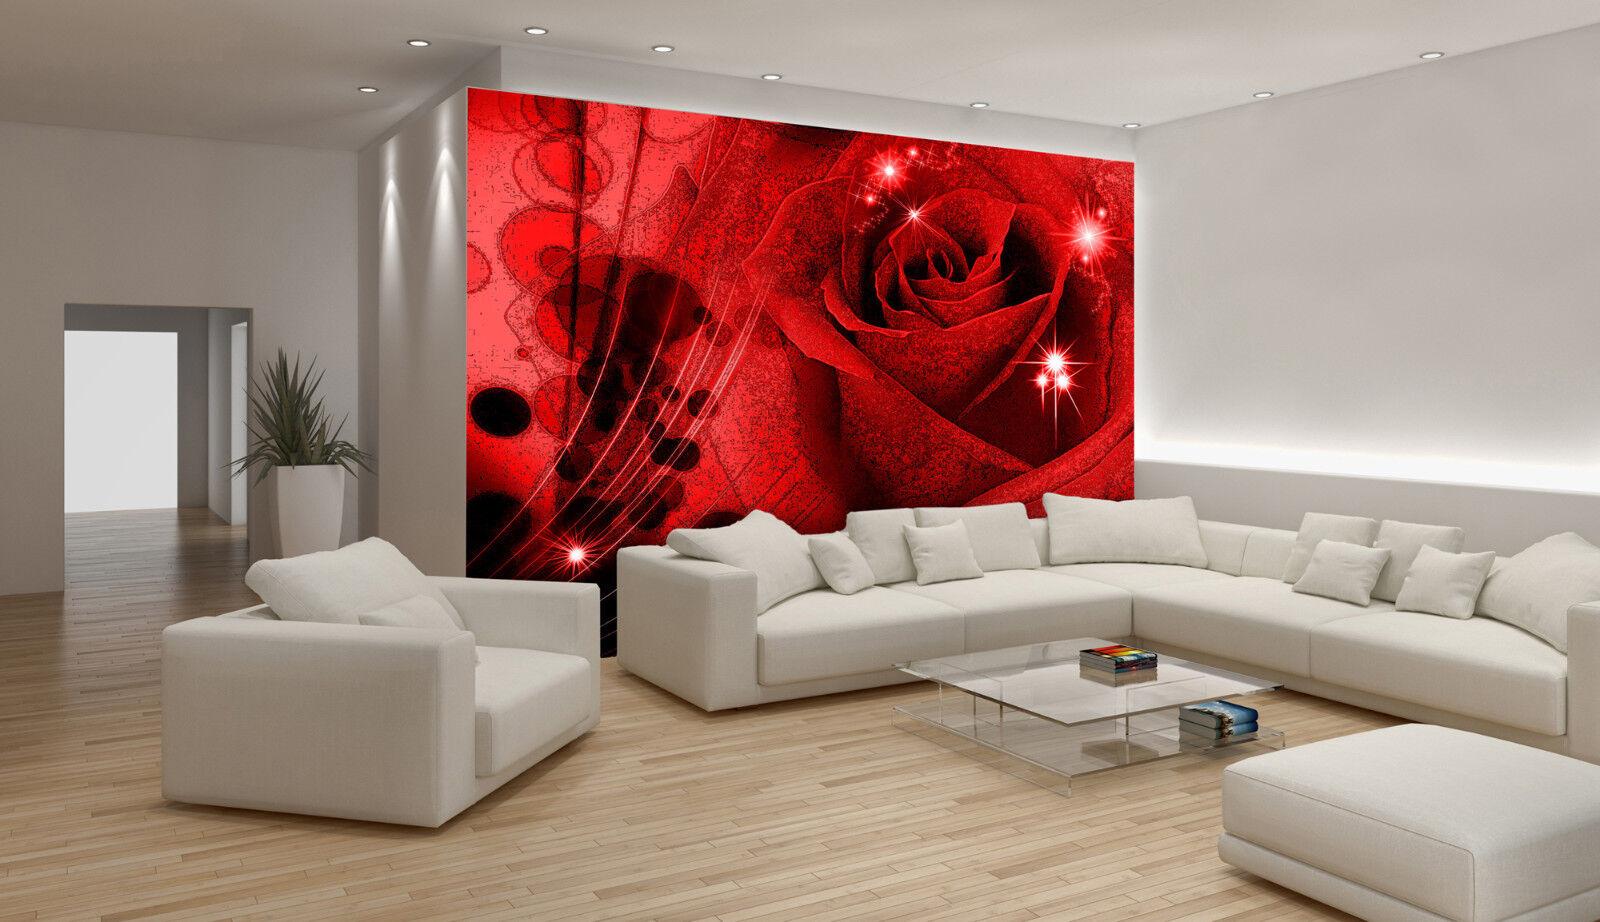 VLIES VLIES VLIES Fototapete-ROTE ROSE-(339)-Design Blumen Orchideen Blüten Pflanzen Deco 246106